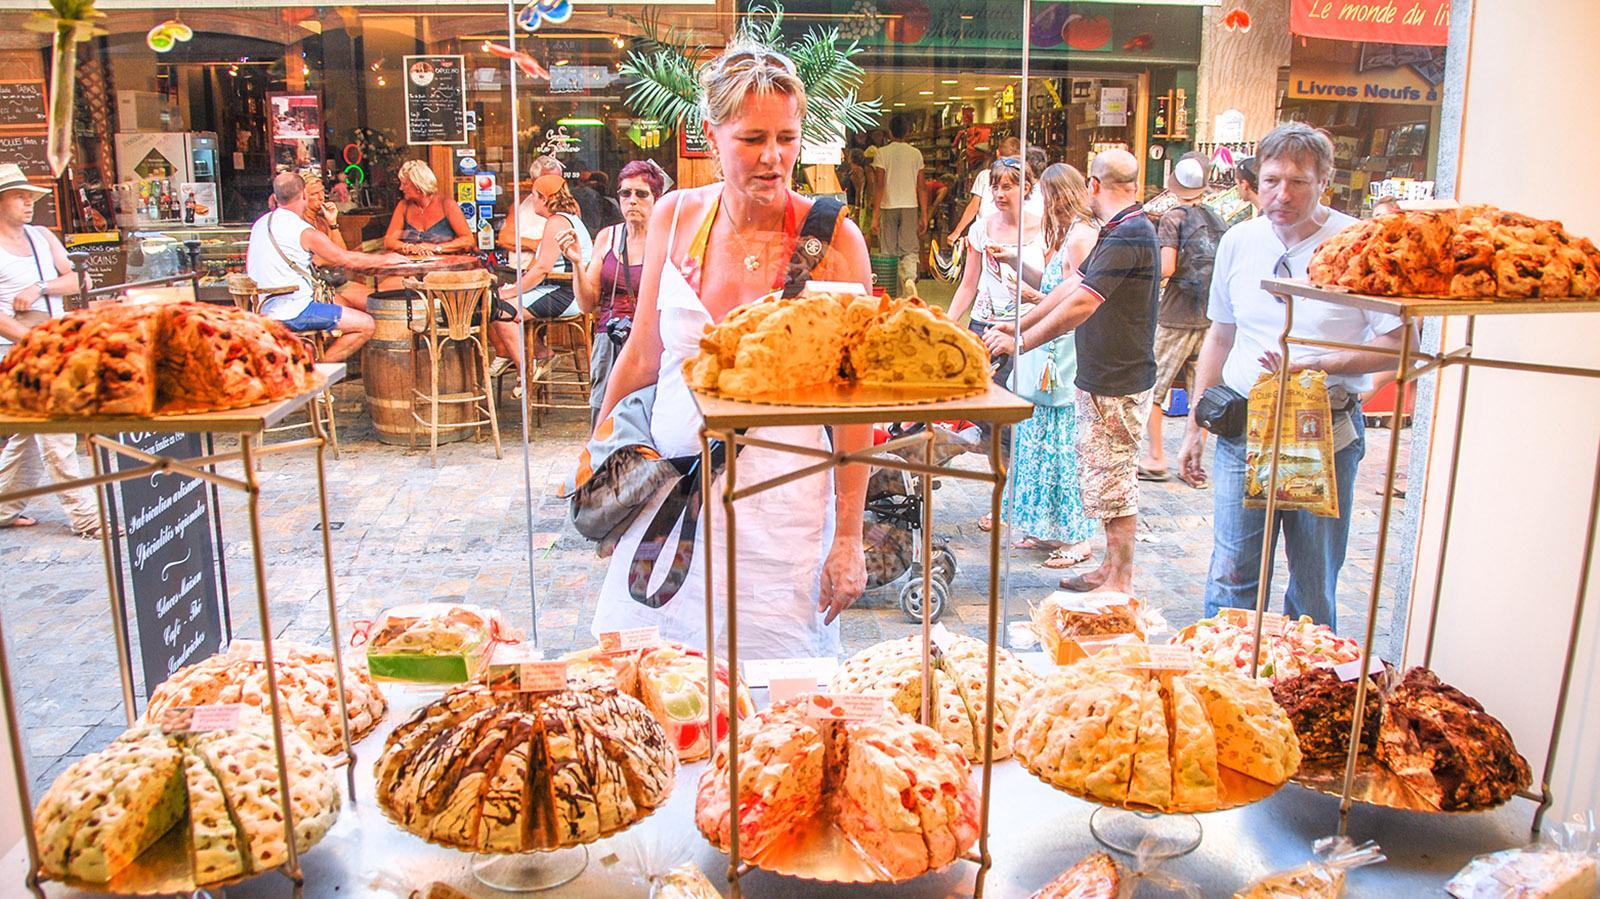 Nougat-Träume bei einem Pâtissier in Aigues-Mortes. Foto: Hilke Maunder